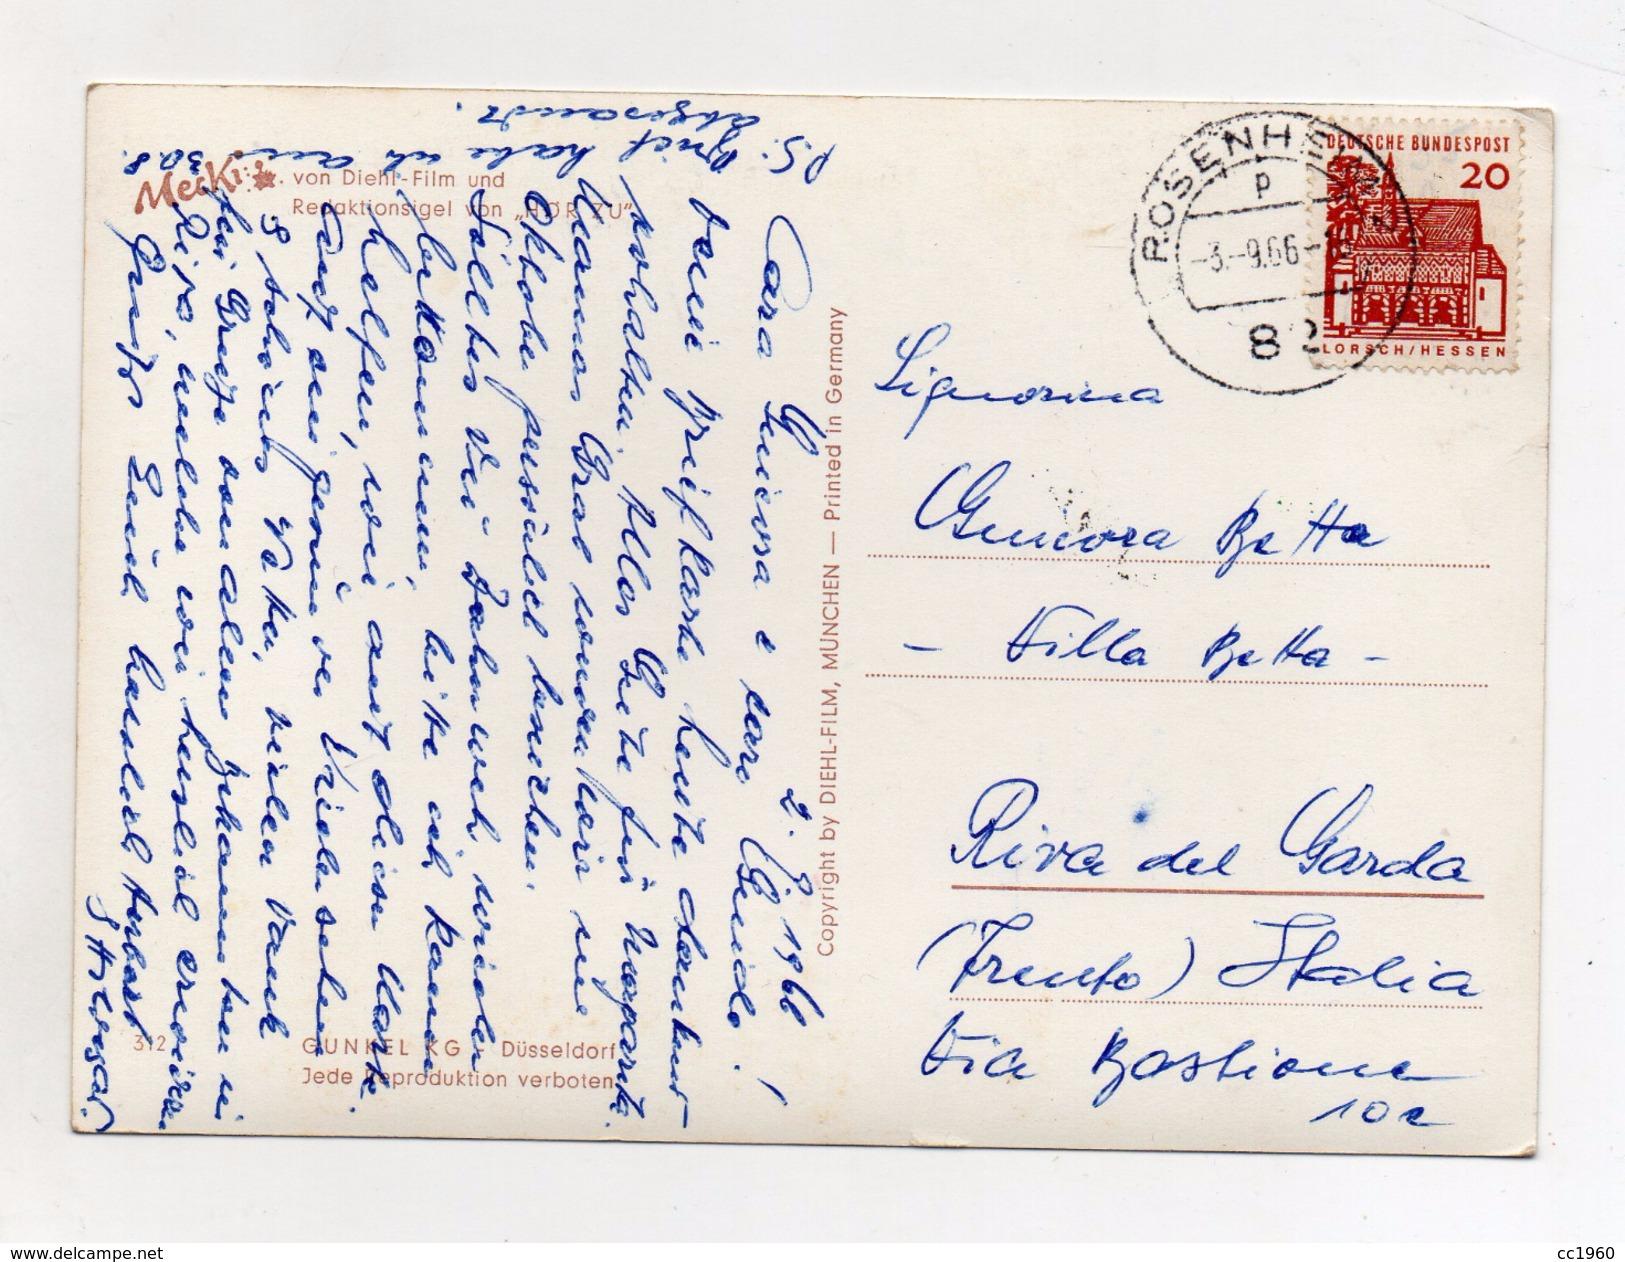 MECKI - Rasche Hilfe Tut Not - Viaggiata Nel 1966 - (FDC4414) - Cartolina Nr. 312 - Mecki